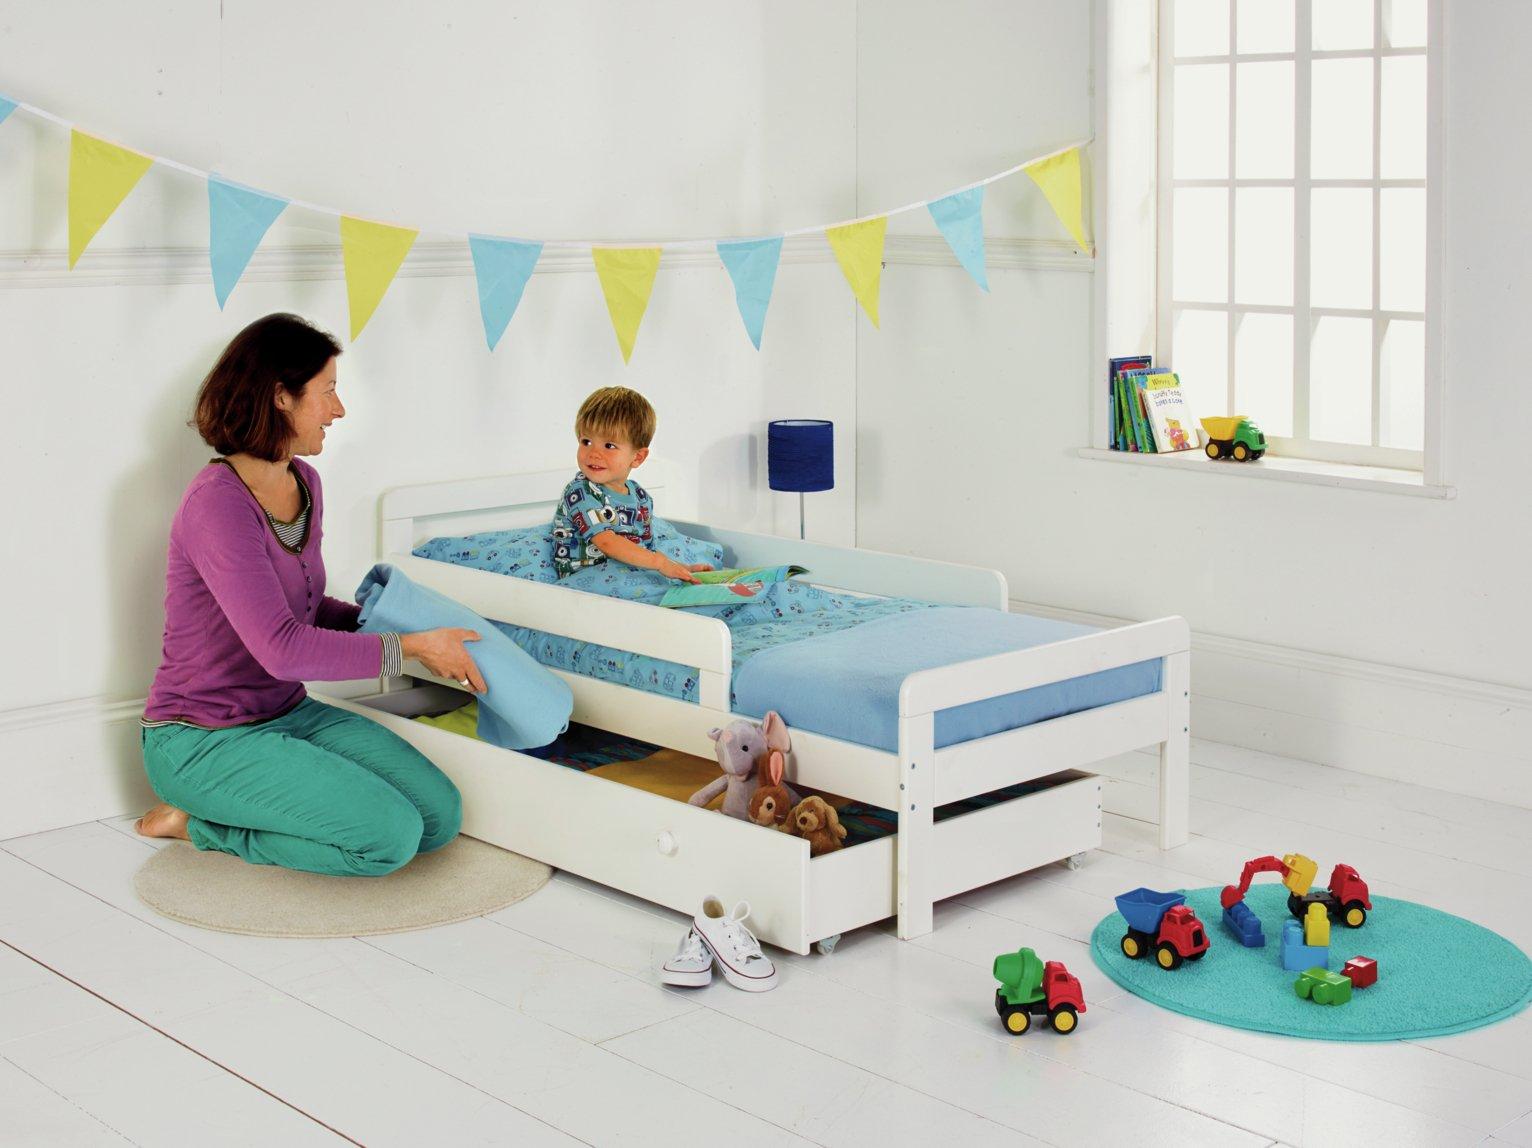 Buy Argos Home Ellis White Toddler Bed Frame With Storage | Kids Beds |  Argos